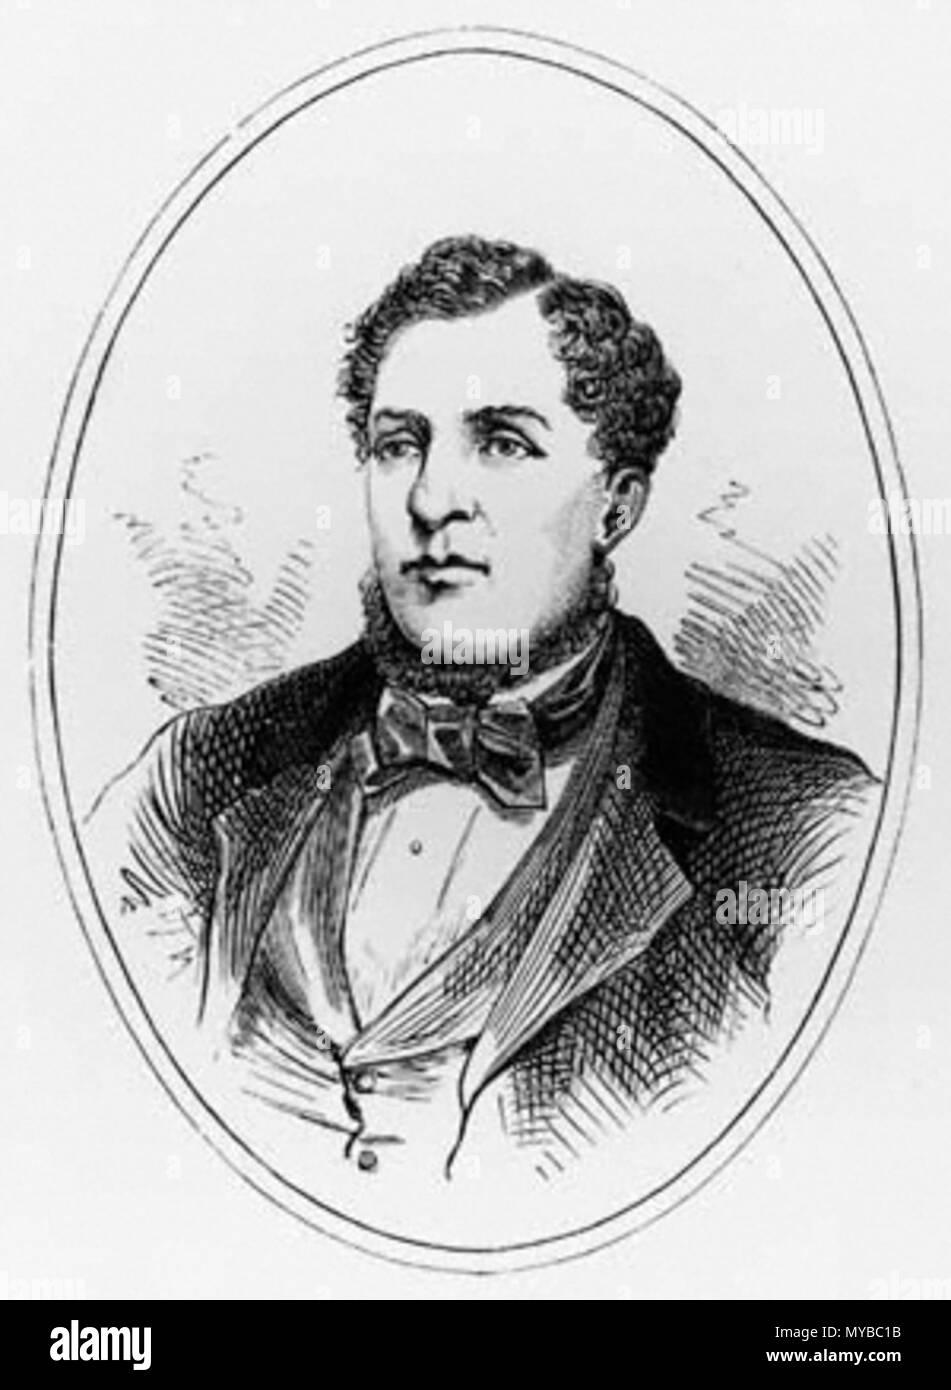 . Portrait of Ben Caunt . 1850s. Unknown 70 BenCaunt Stock Photo